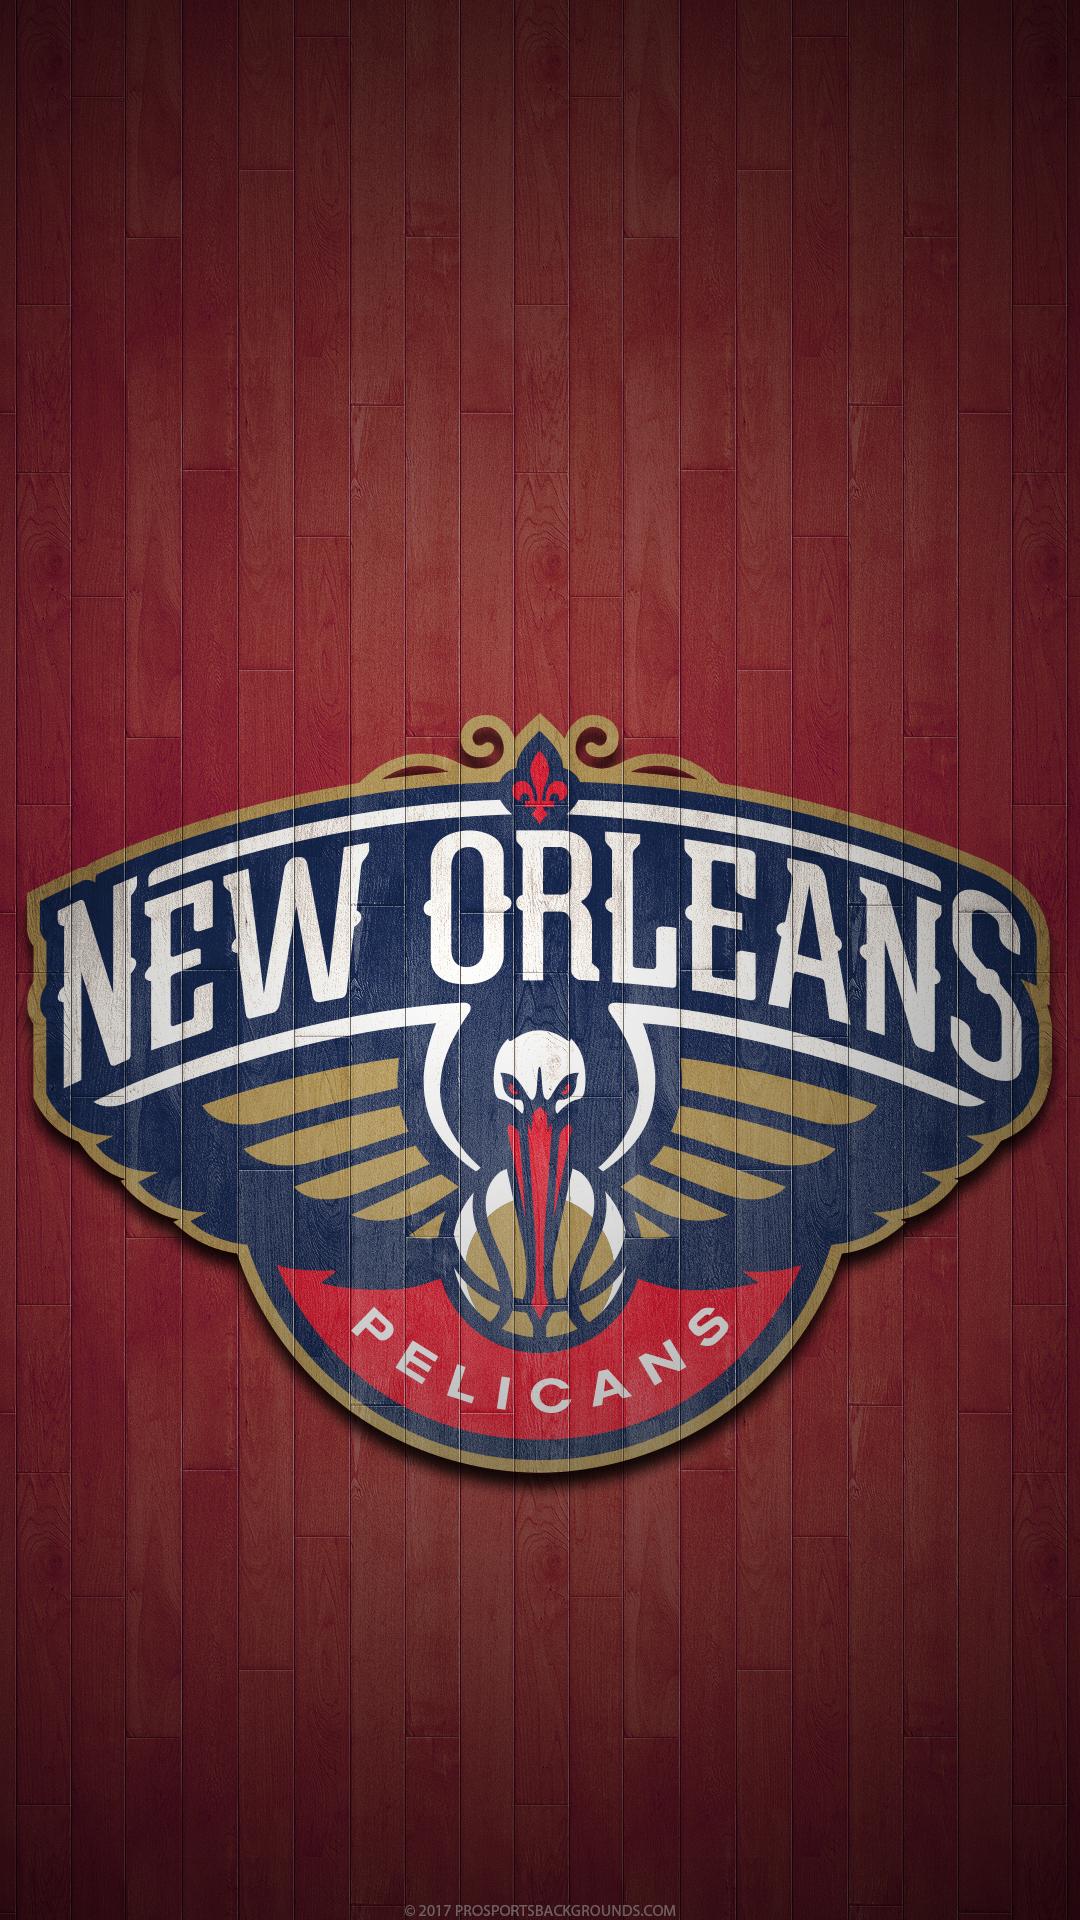 Sports New Orleans Pelicans 1080x1920 Wallpaper Id 763007